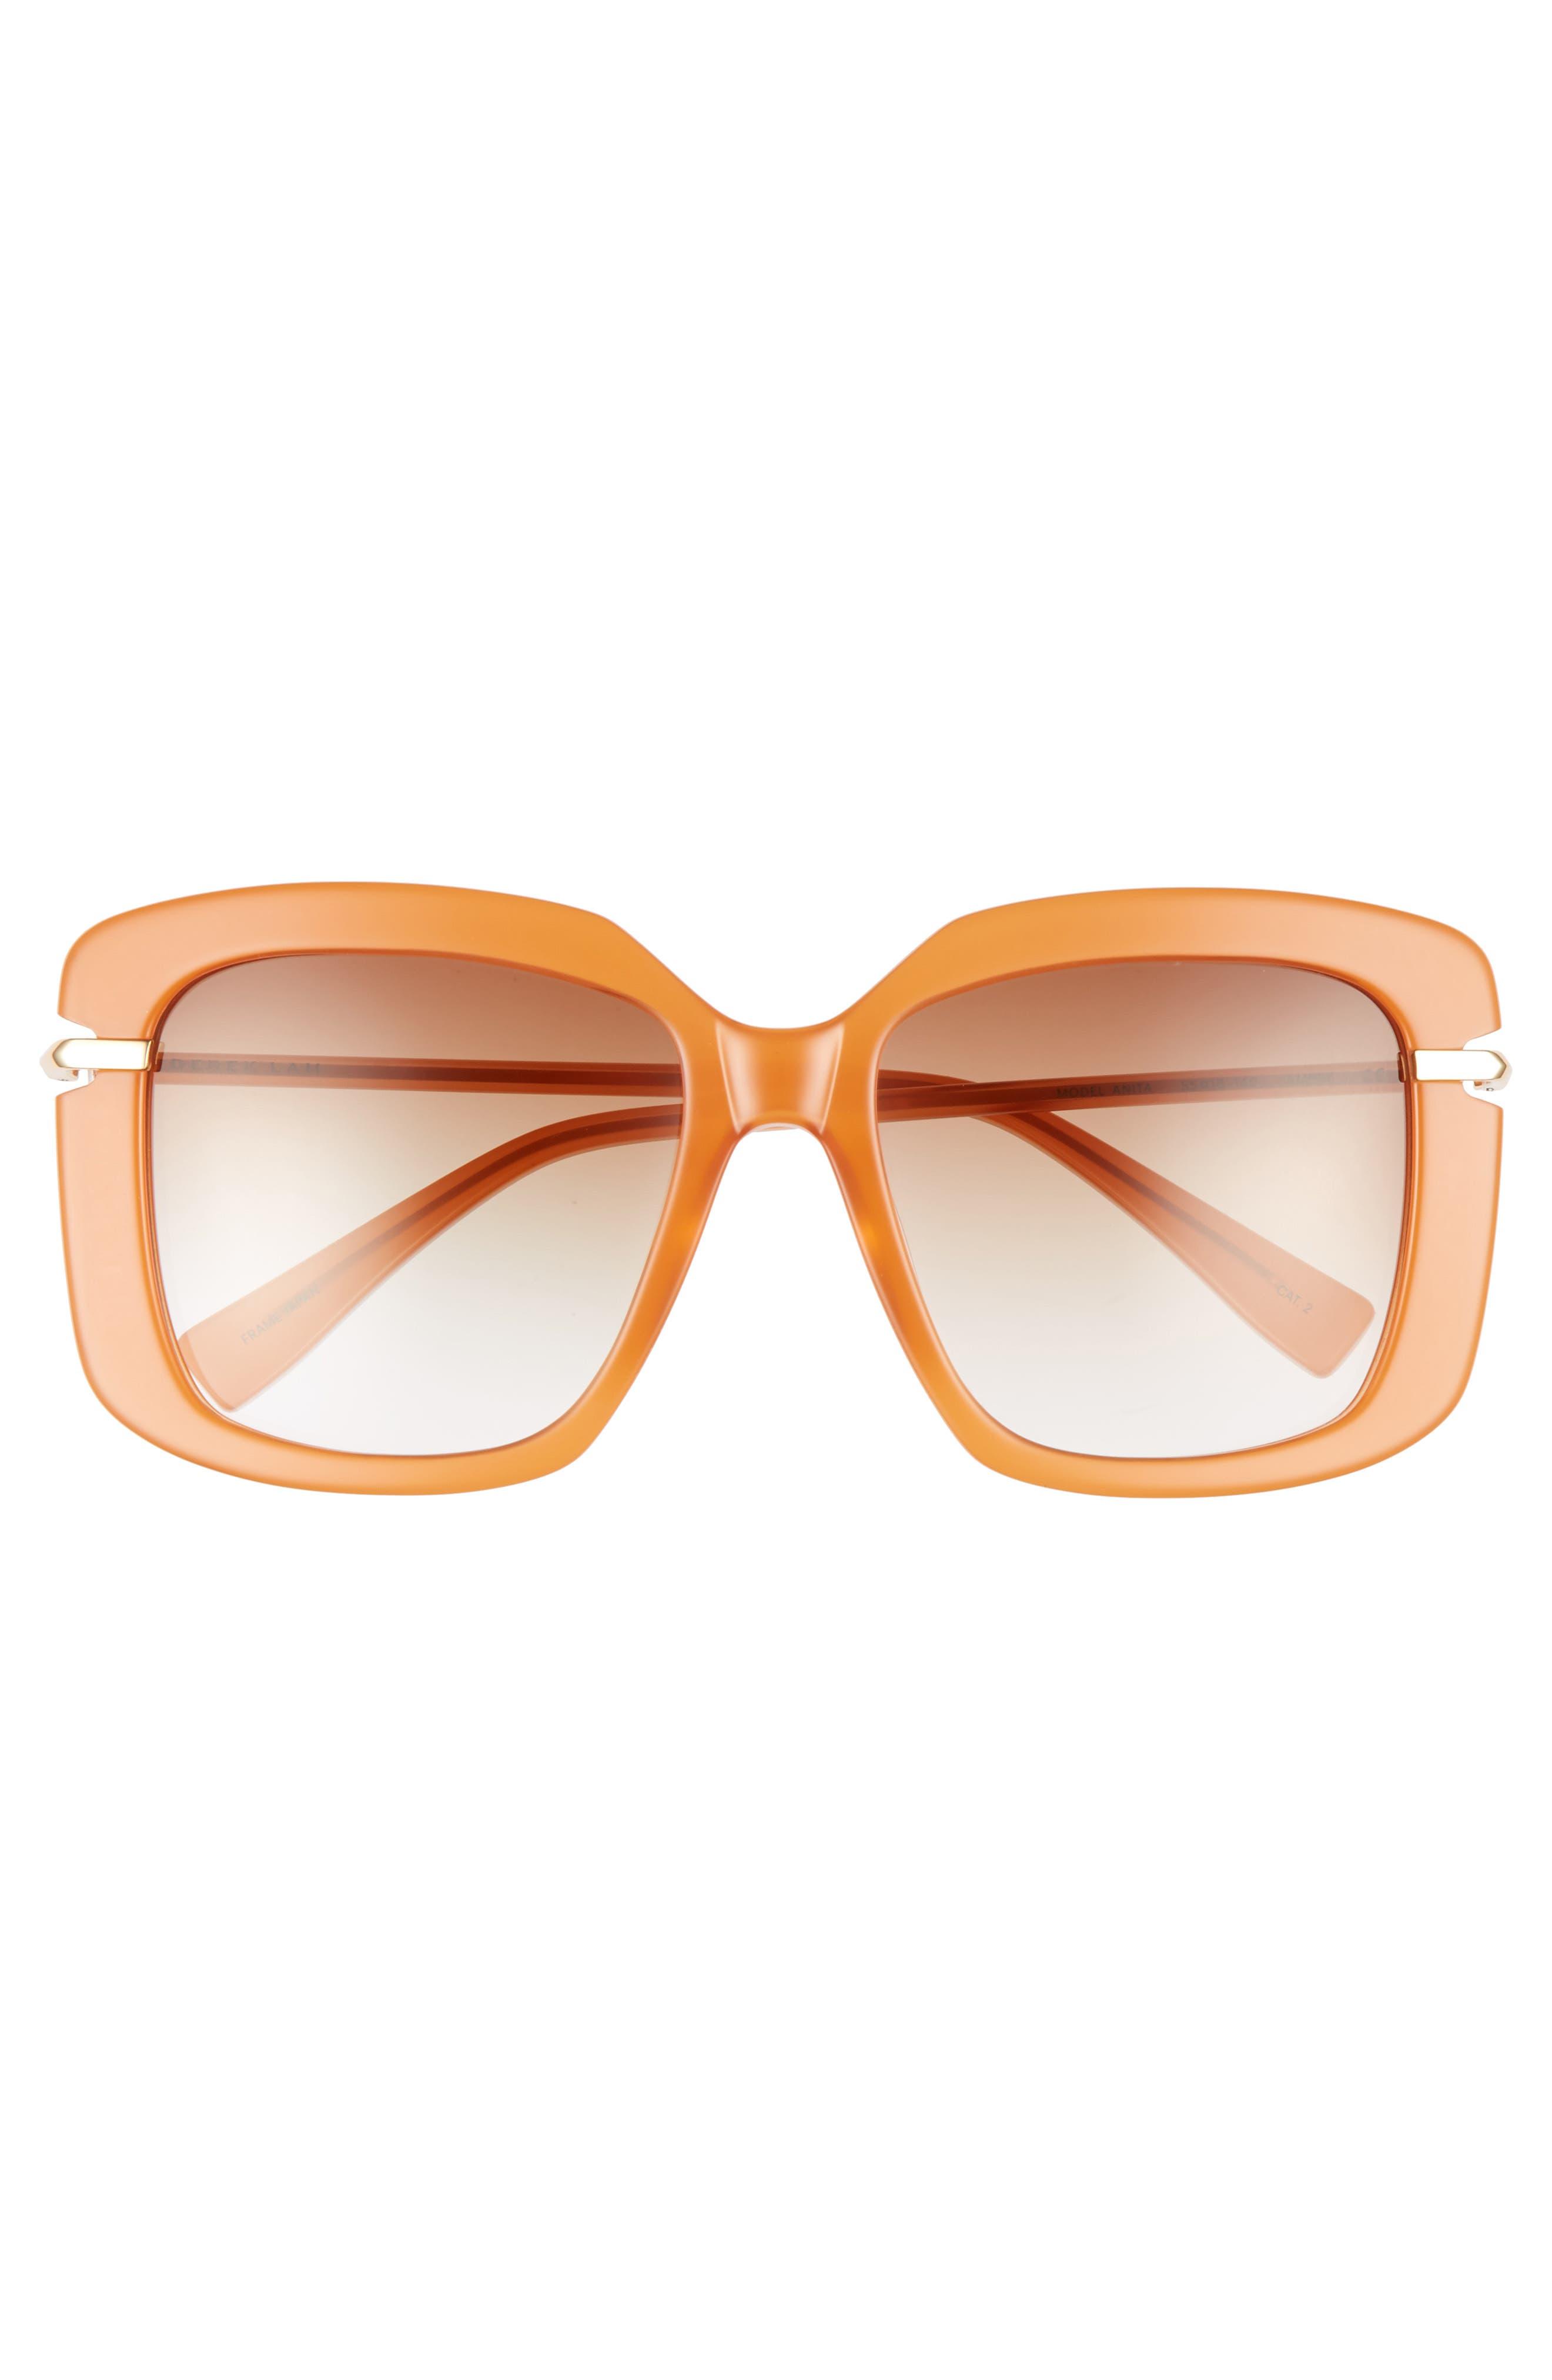 Anita 55mm Square Sunglasses,                             Alternate thumbnail 3, color,                             AMBER